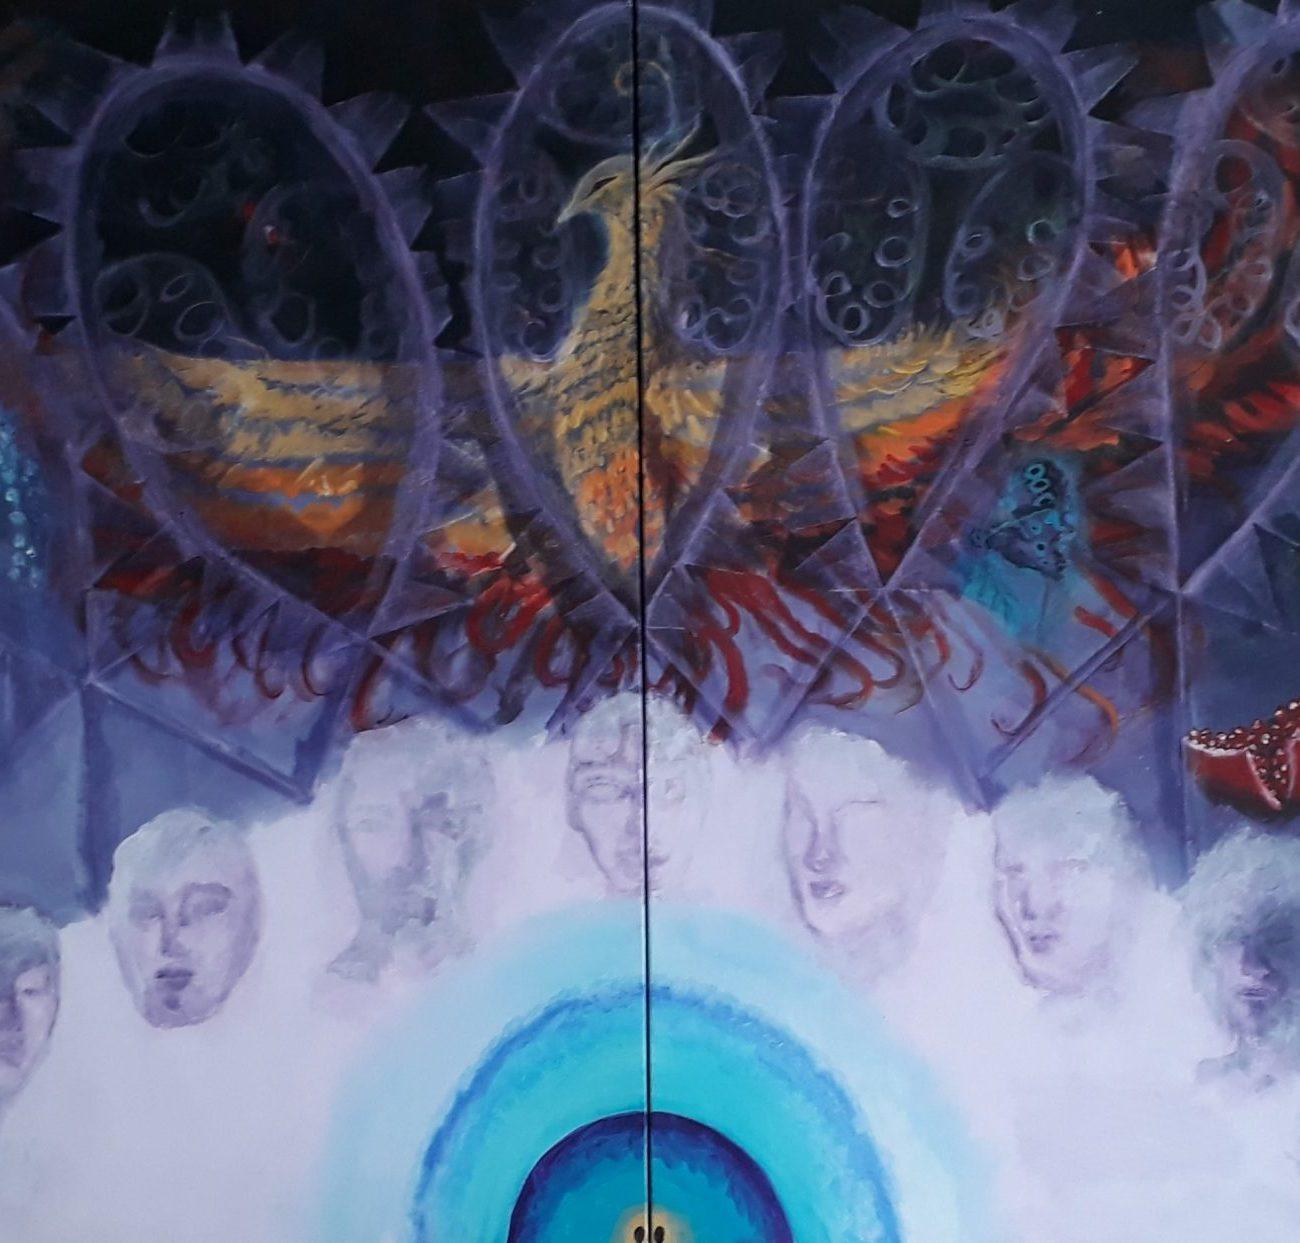 LA Vibrasyonu   Teknik : Tuval Üzeri Yağlı Boya Ölçü: 200x100 cm  Fiya: 9000 TL